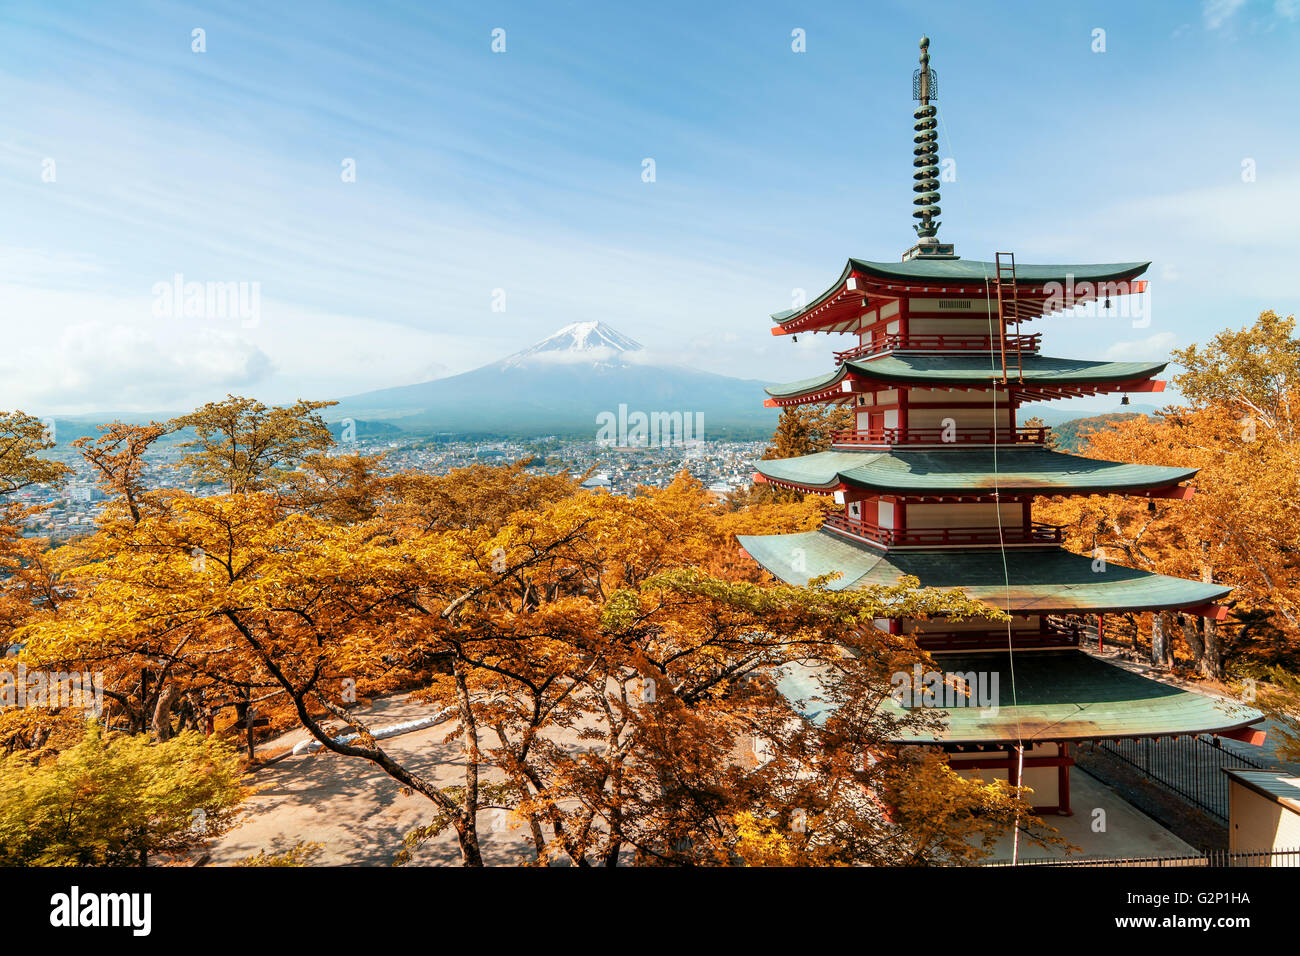 Reisen in Japan - Beuatiful Herbst in Japan rote Pagode mit Mt. Fuji im Hintergrund, Japan. Stockbild